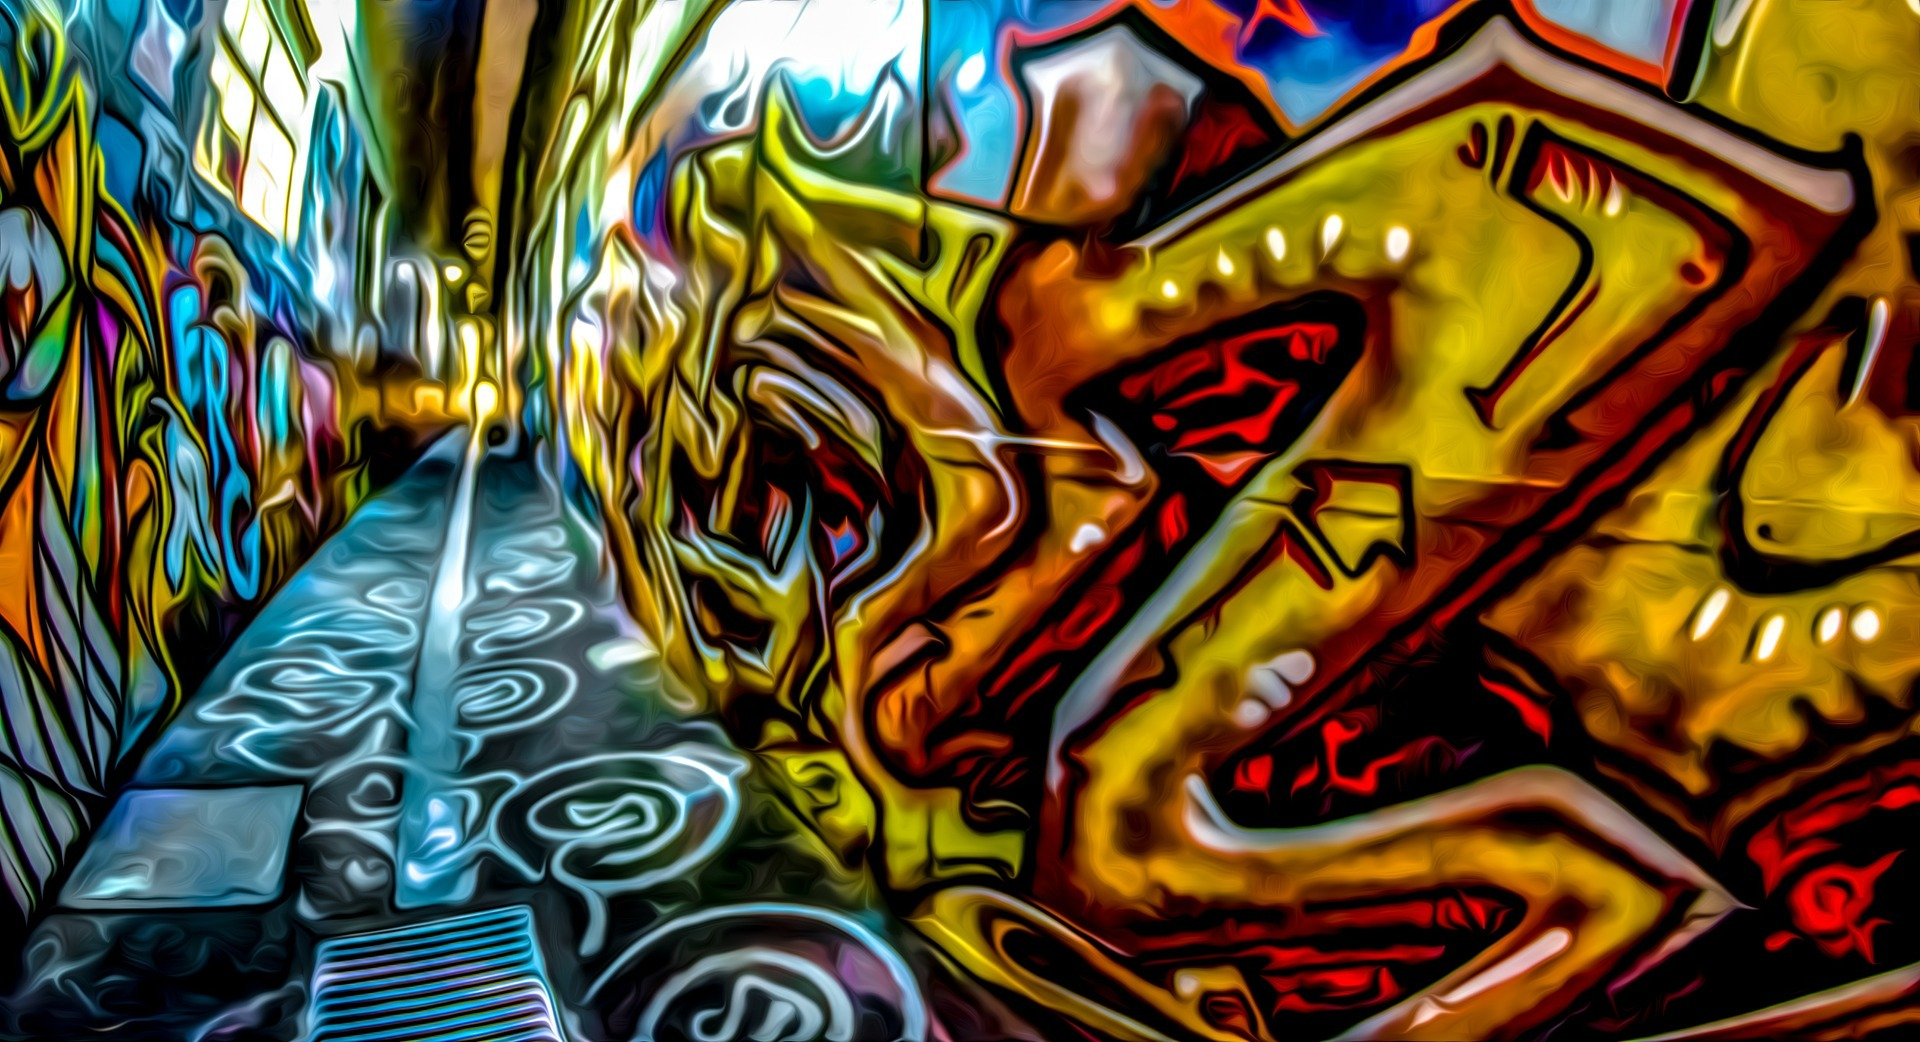 Graffiti Art Wallpapers, Collection of Graffiti Art Backgrounds